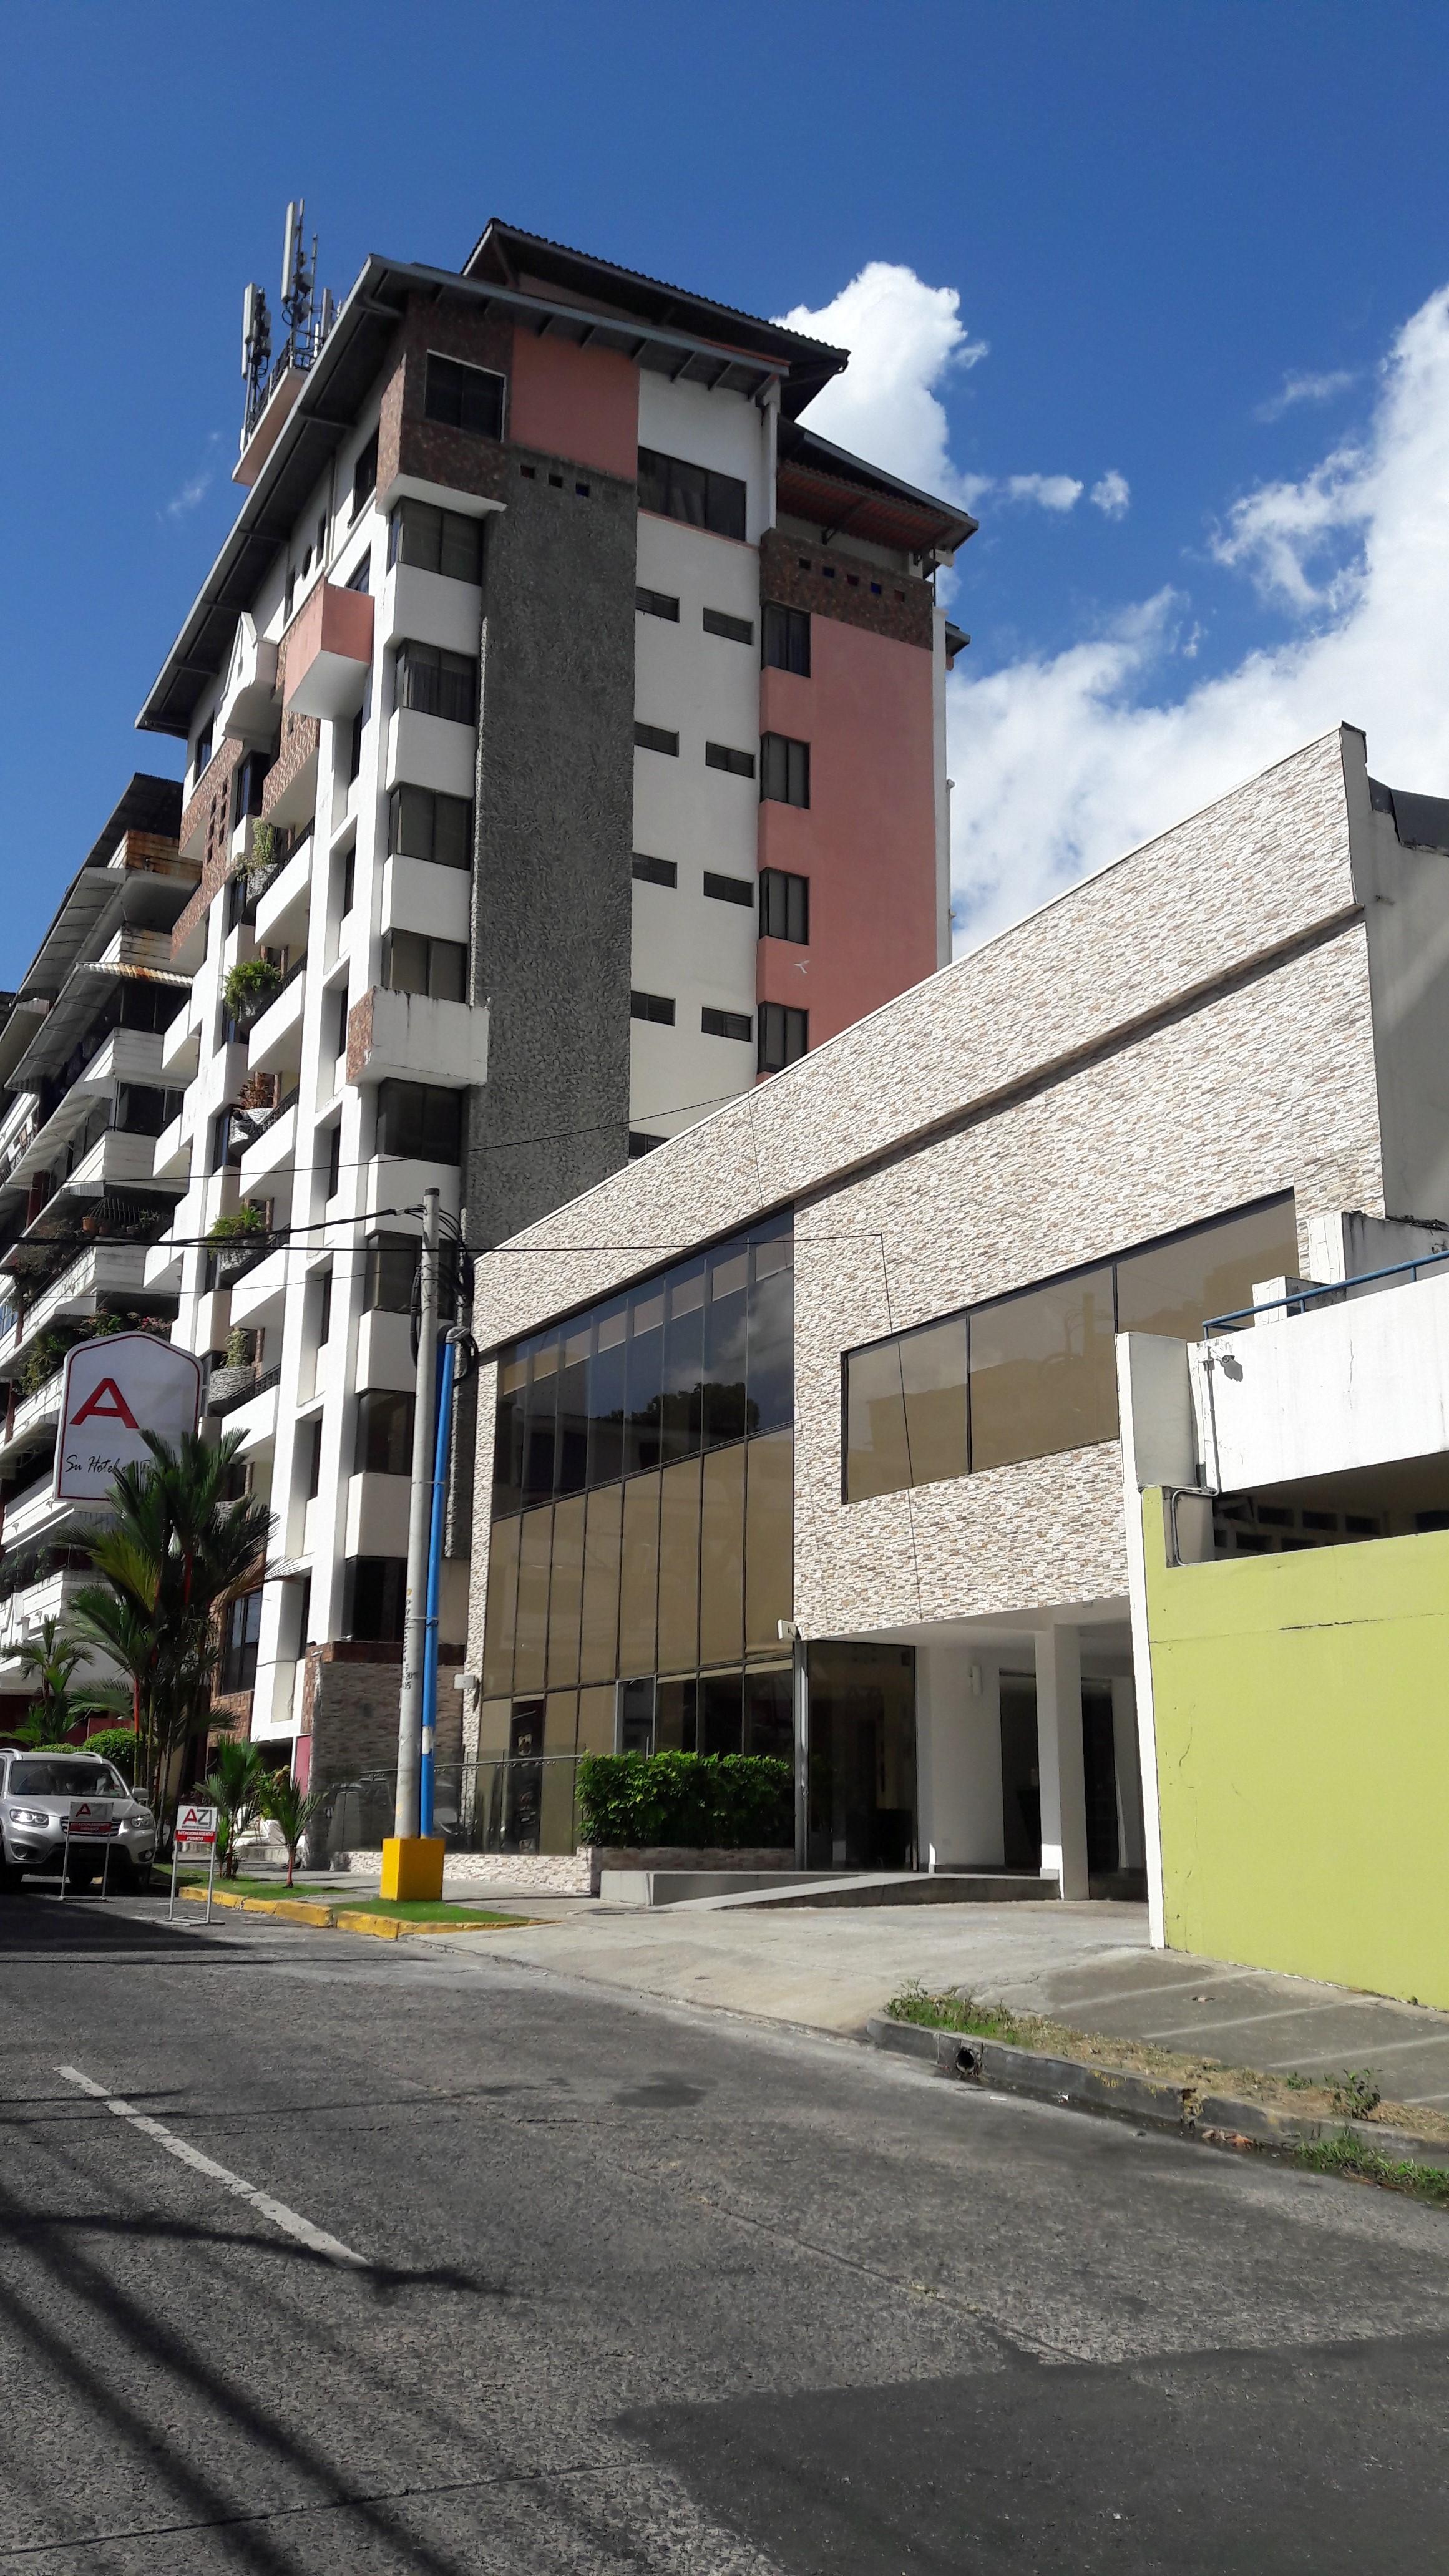 AZ Hotel & Suites, Panamá